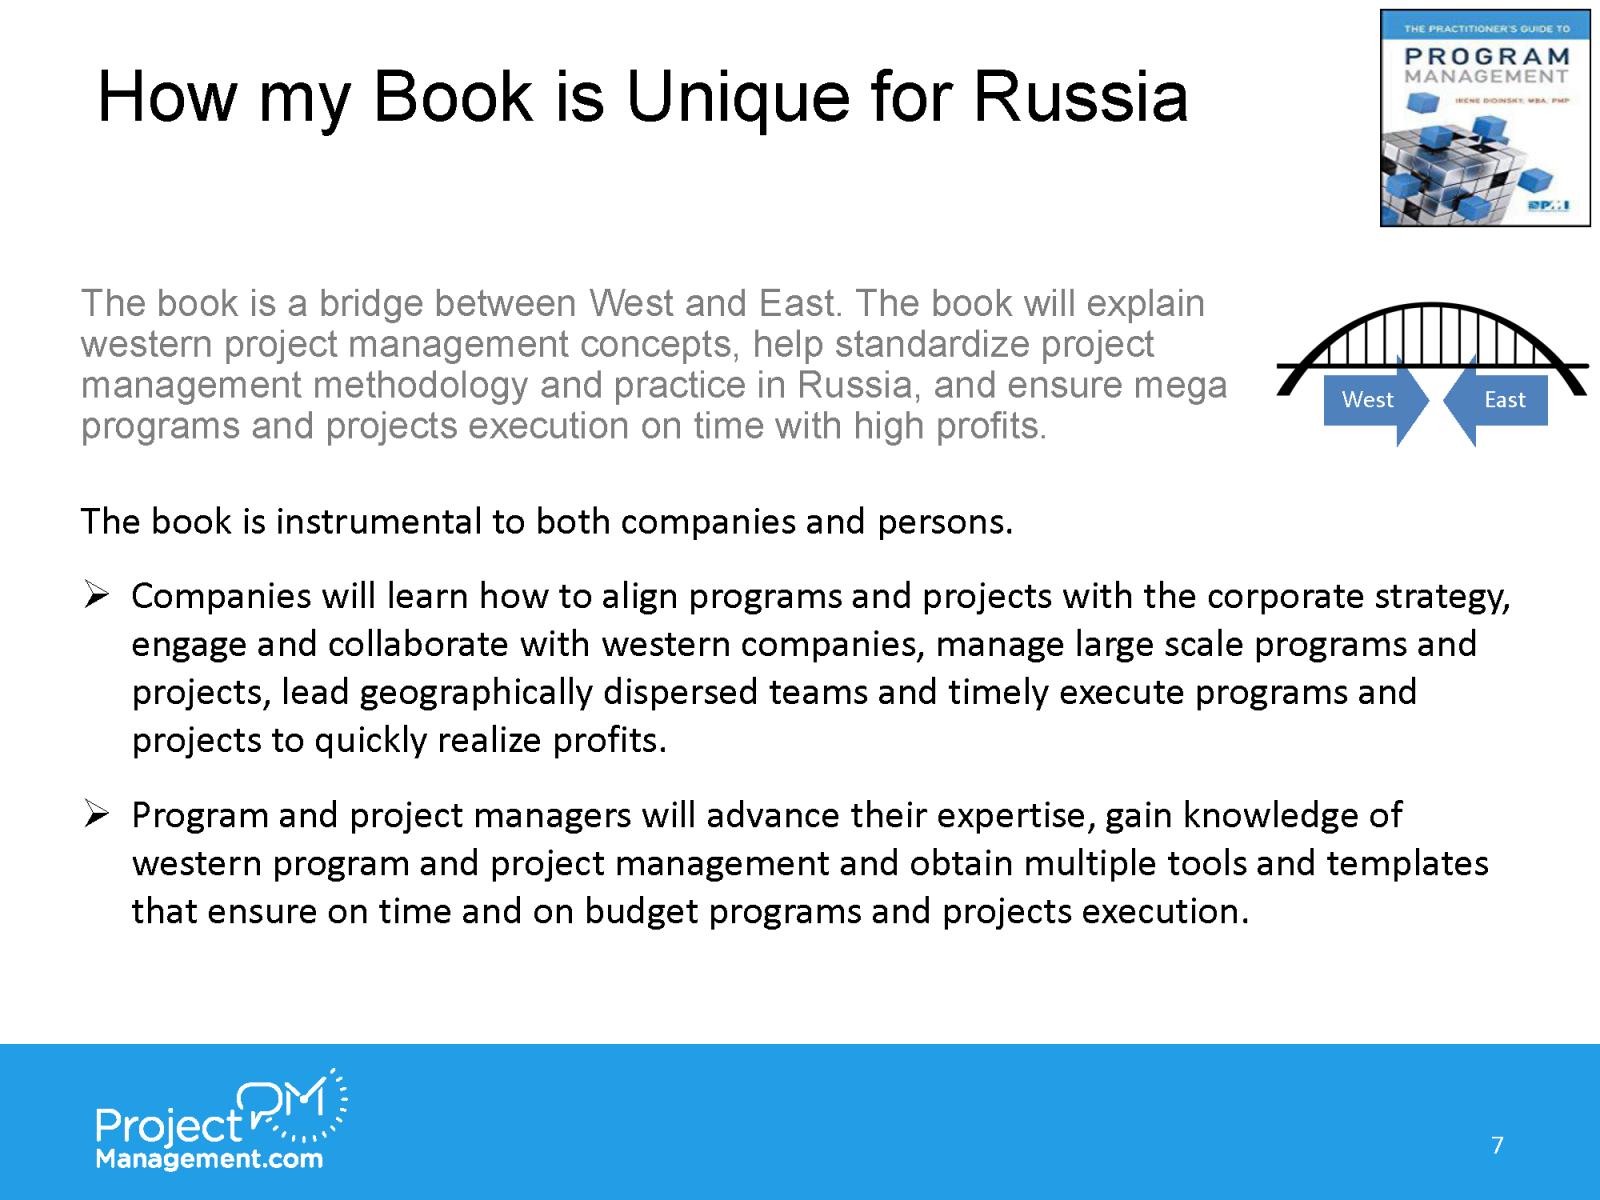 ProjectManagementcom webinar_Irene Didinsky_05112018_FinalFinal_Page_07